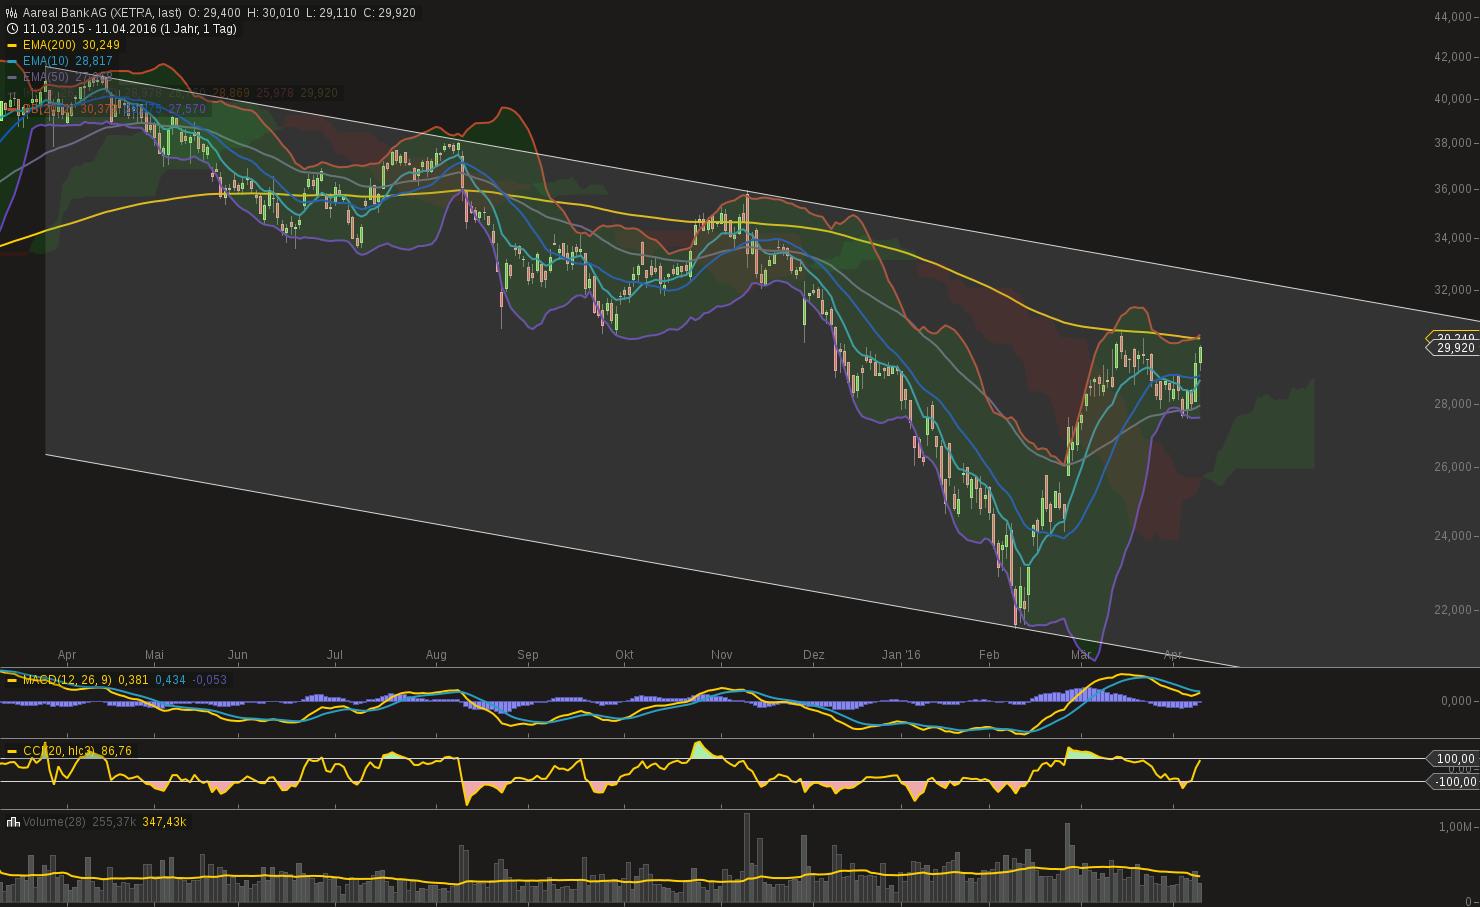 chart-11042016-1627-aareal_bank_ag.png